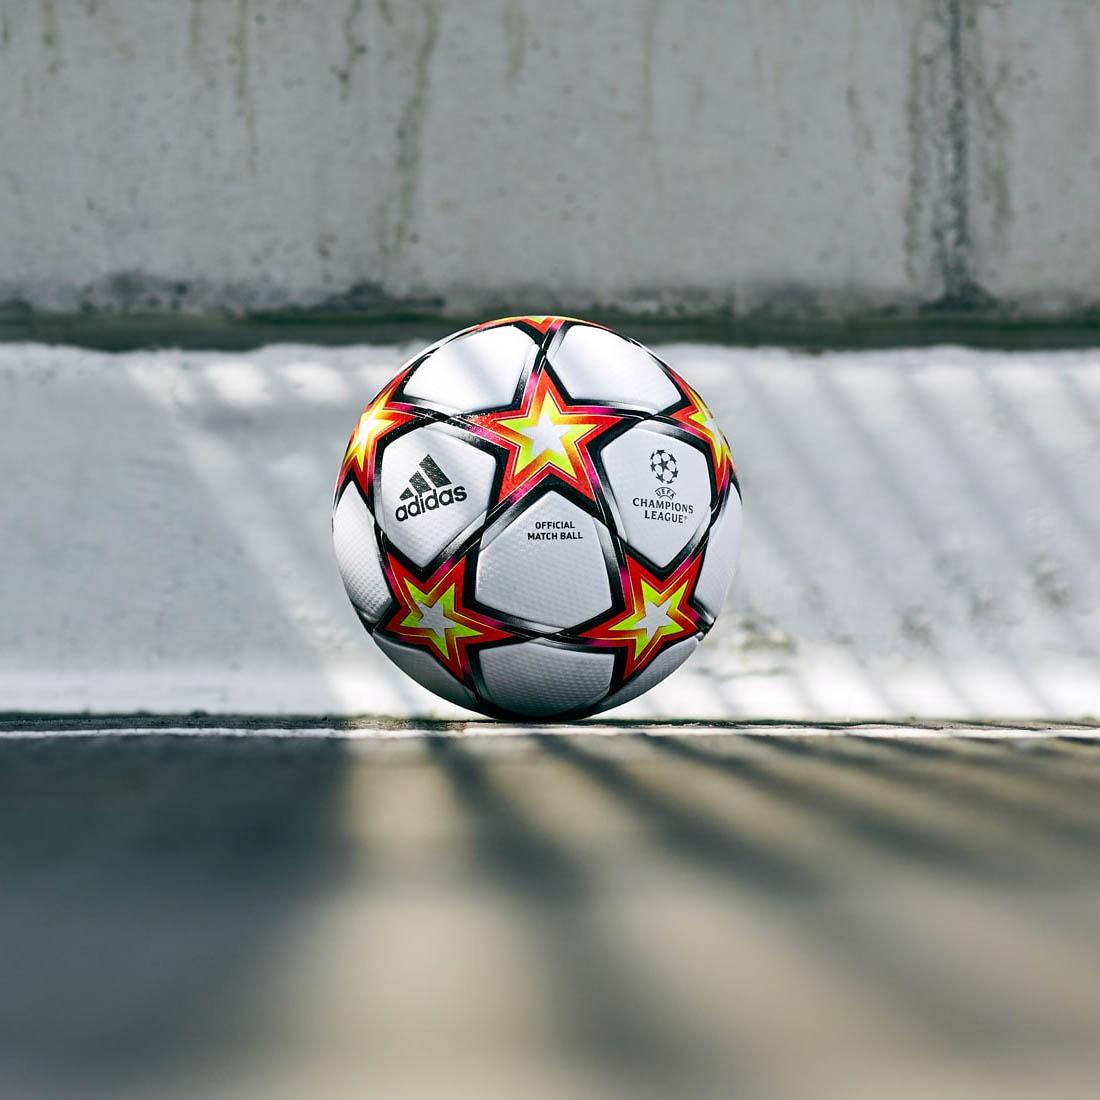 Adidas pyrostorm 2021-2022 Champions League bola